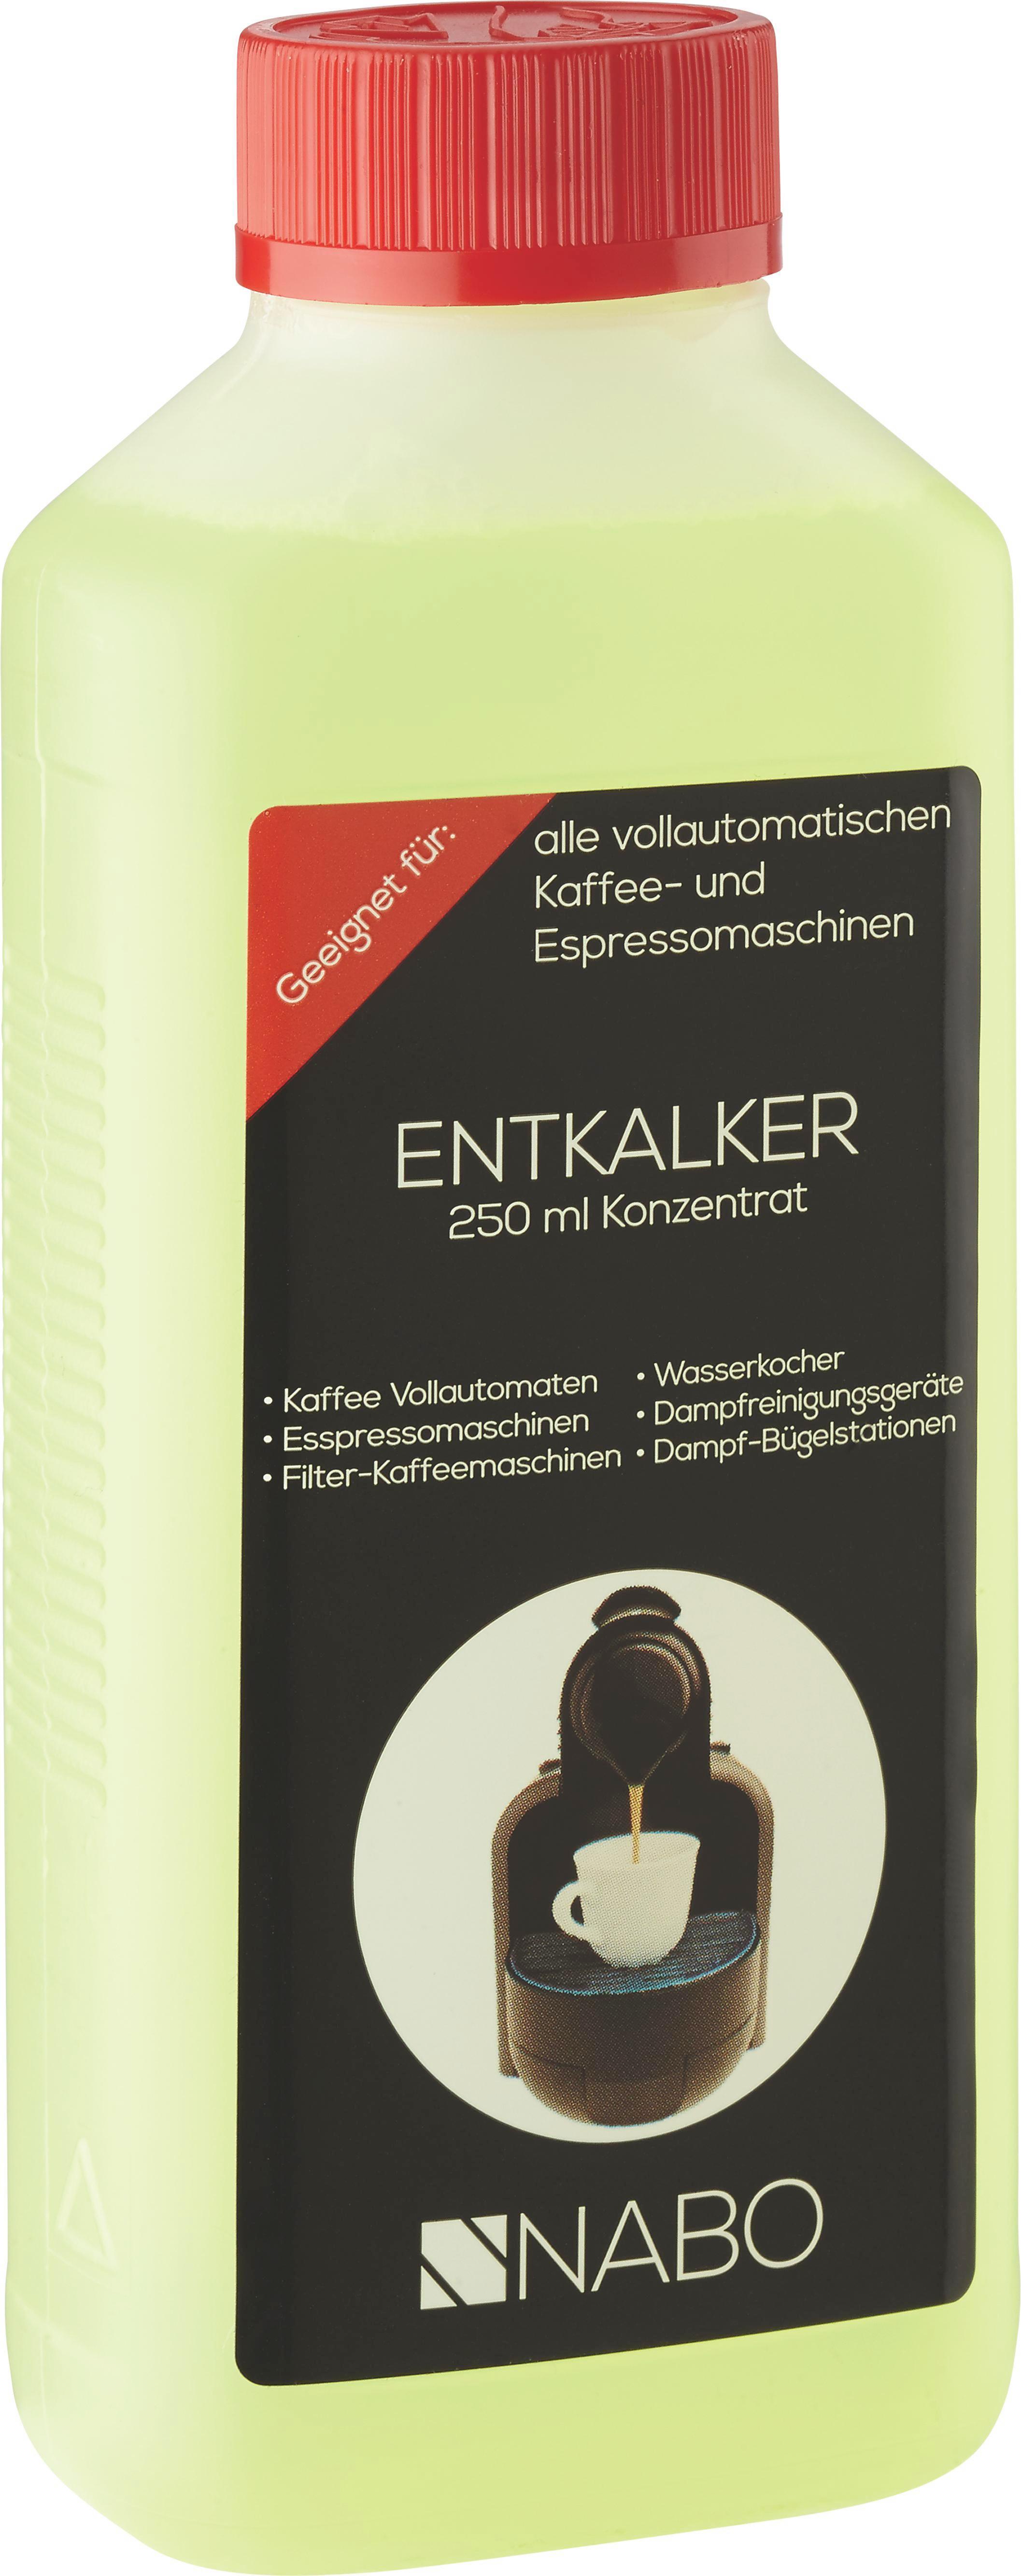 Entkalkungsmittel Universal Entkalker -ext- - (6.5/16/3cm)